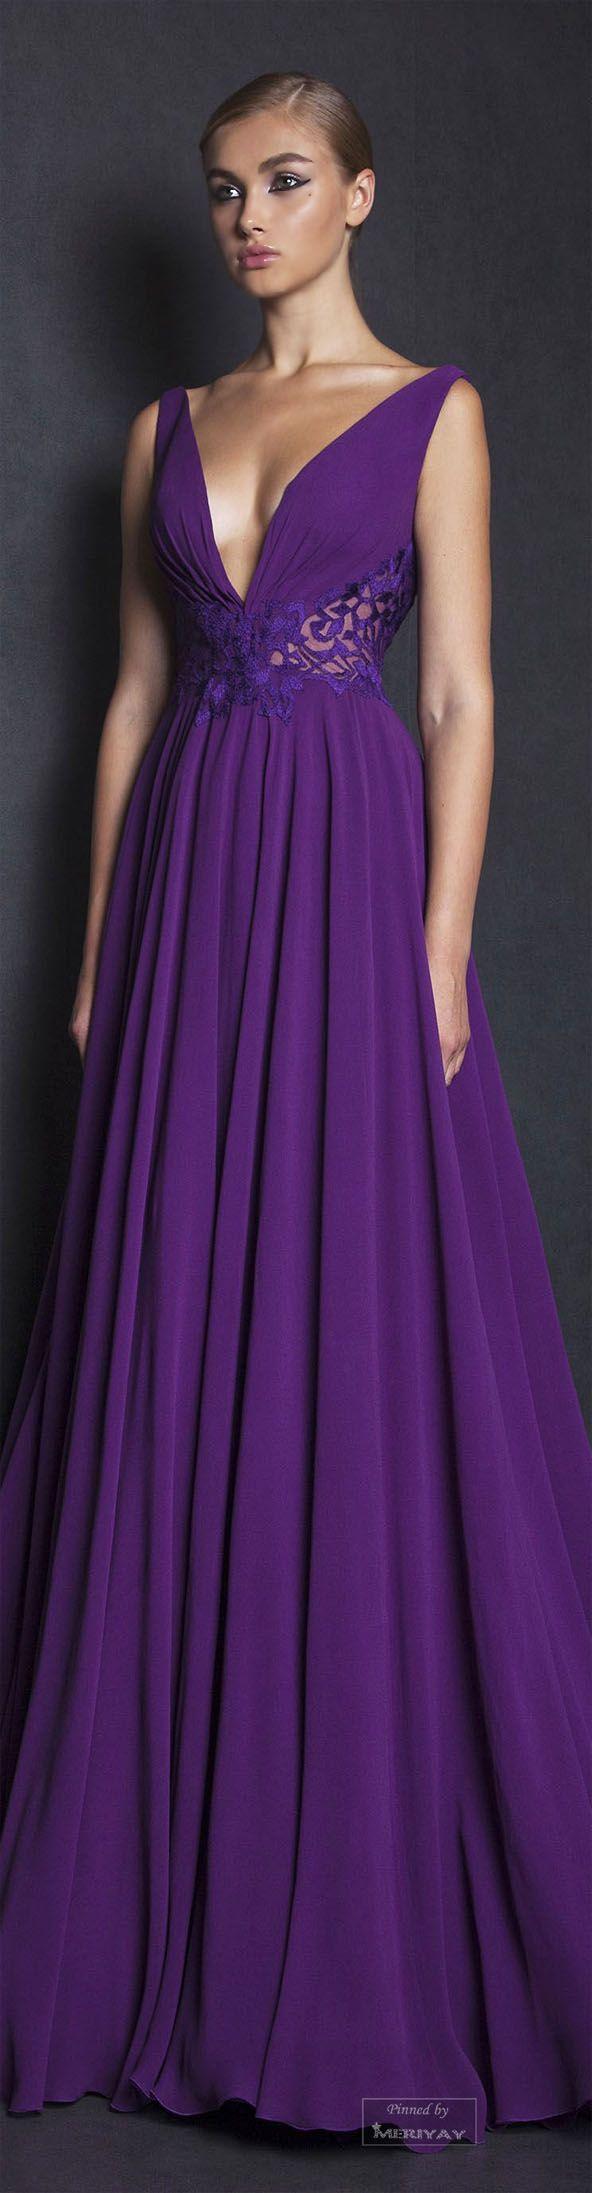 Colores secundarios (violeta)